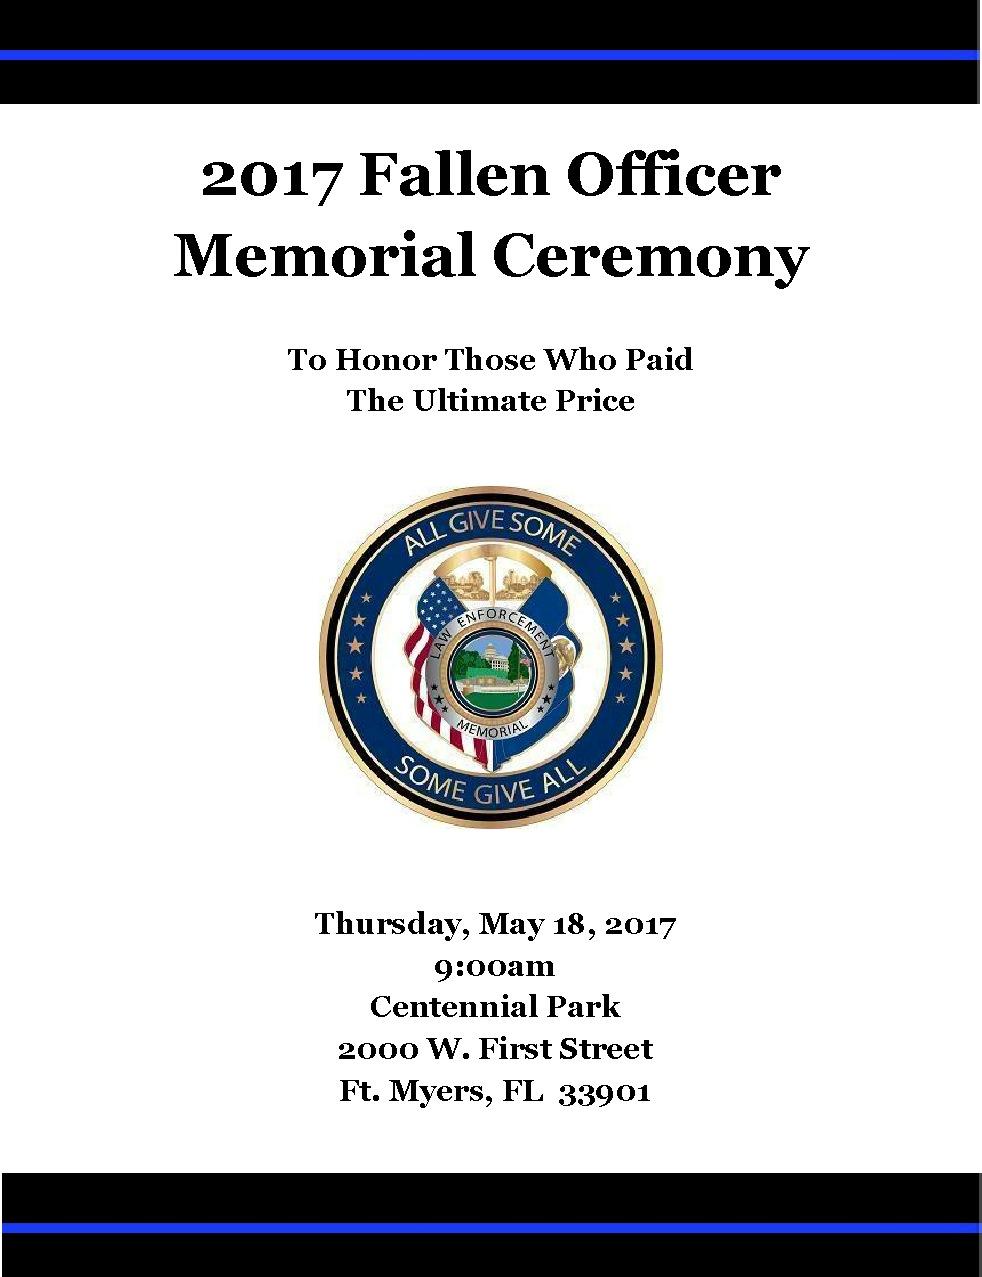 Lee County Fallen Officer Memorial Service Southwest Florida